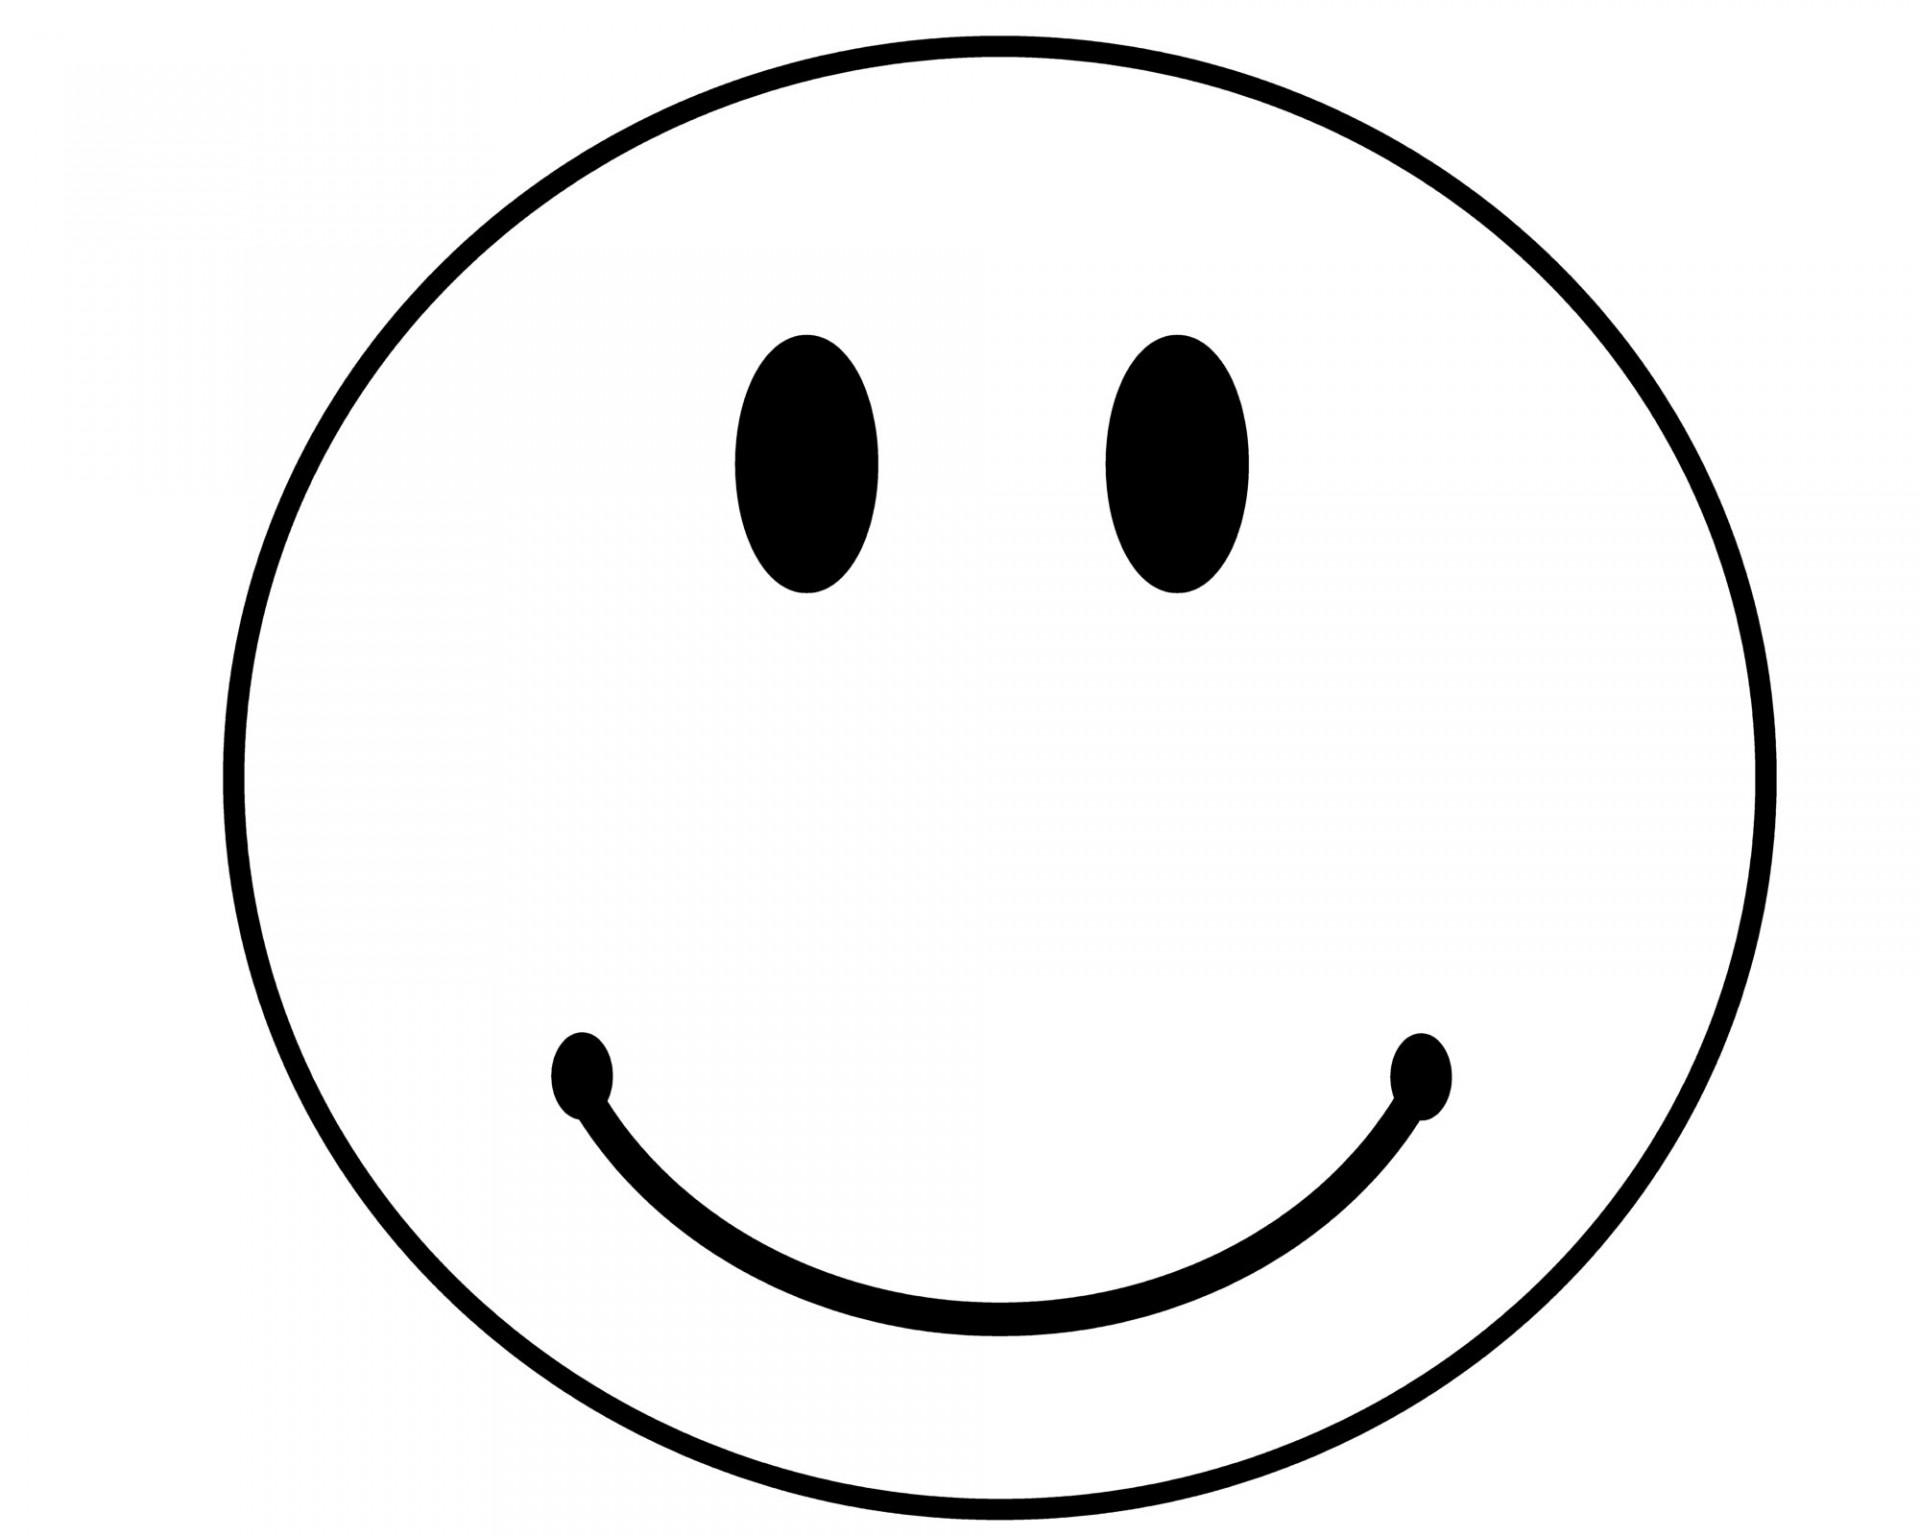 1920x1536 Clip Art Smiley Face Free Stock Photo